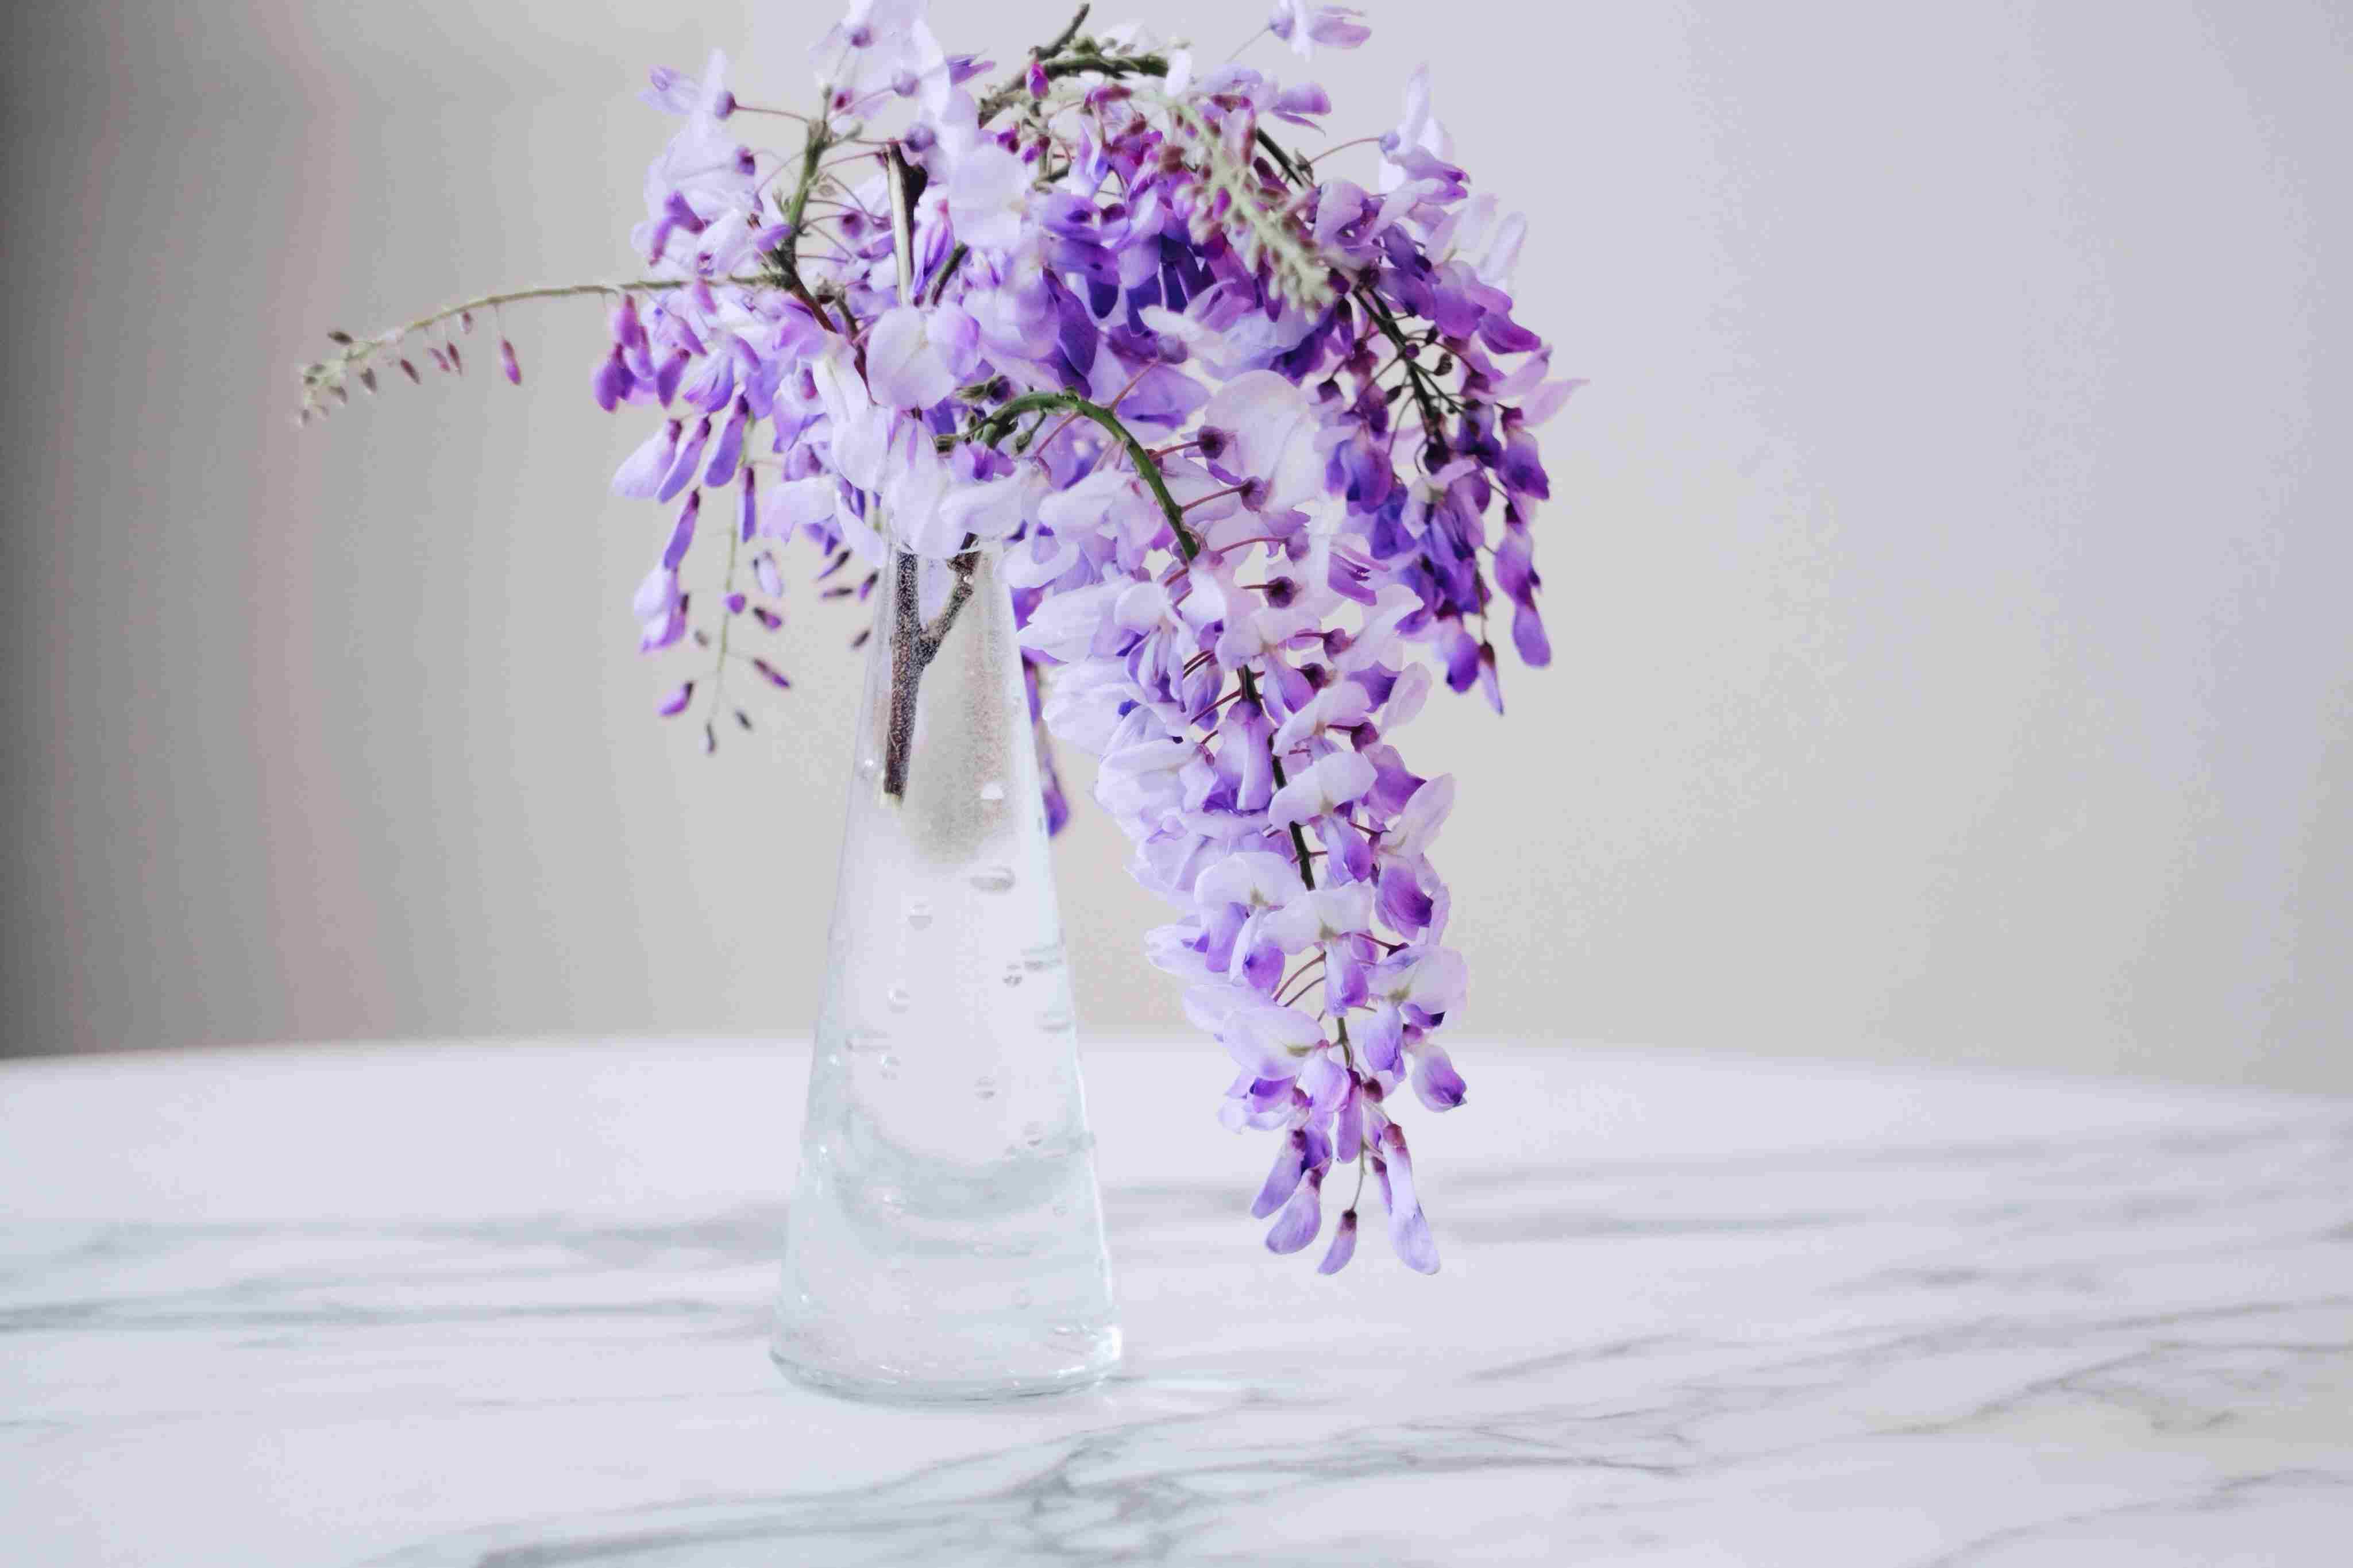 Wisteria Cut Flower